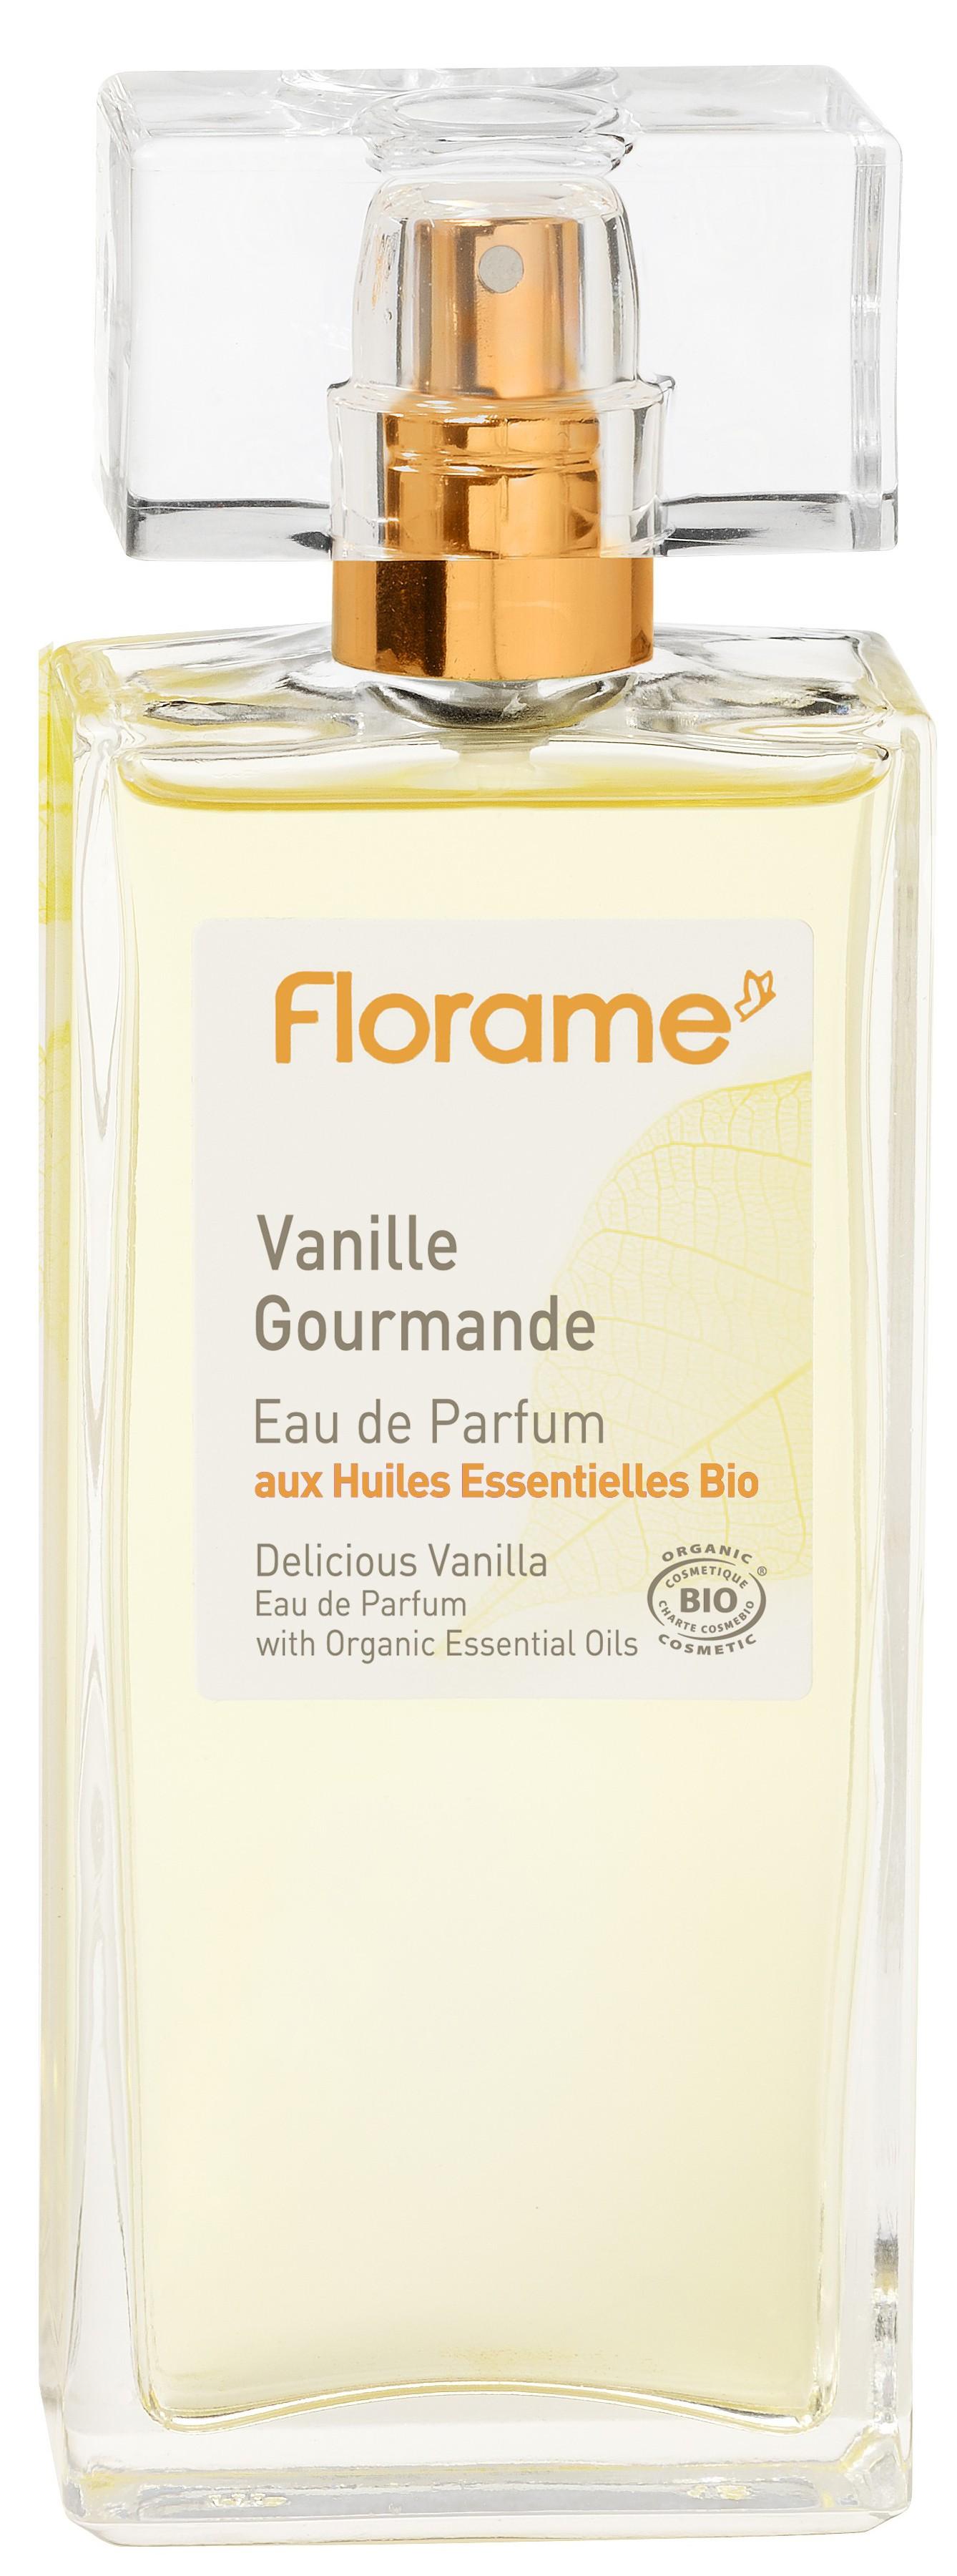 Florame Vanille Gourmande аромат для женщин